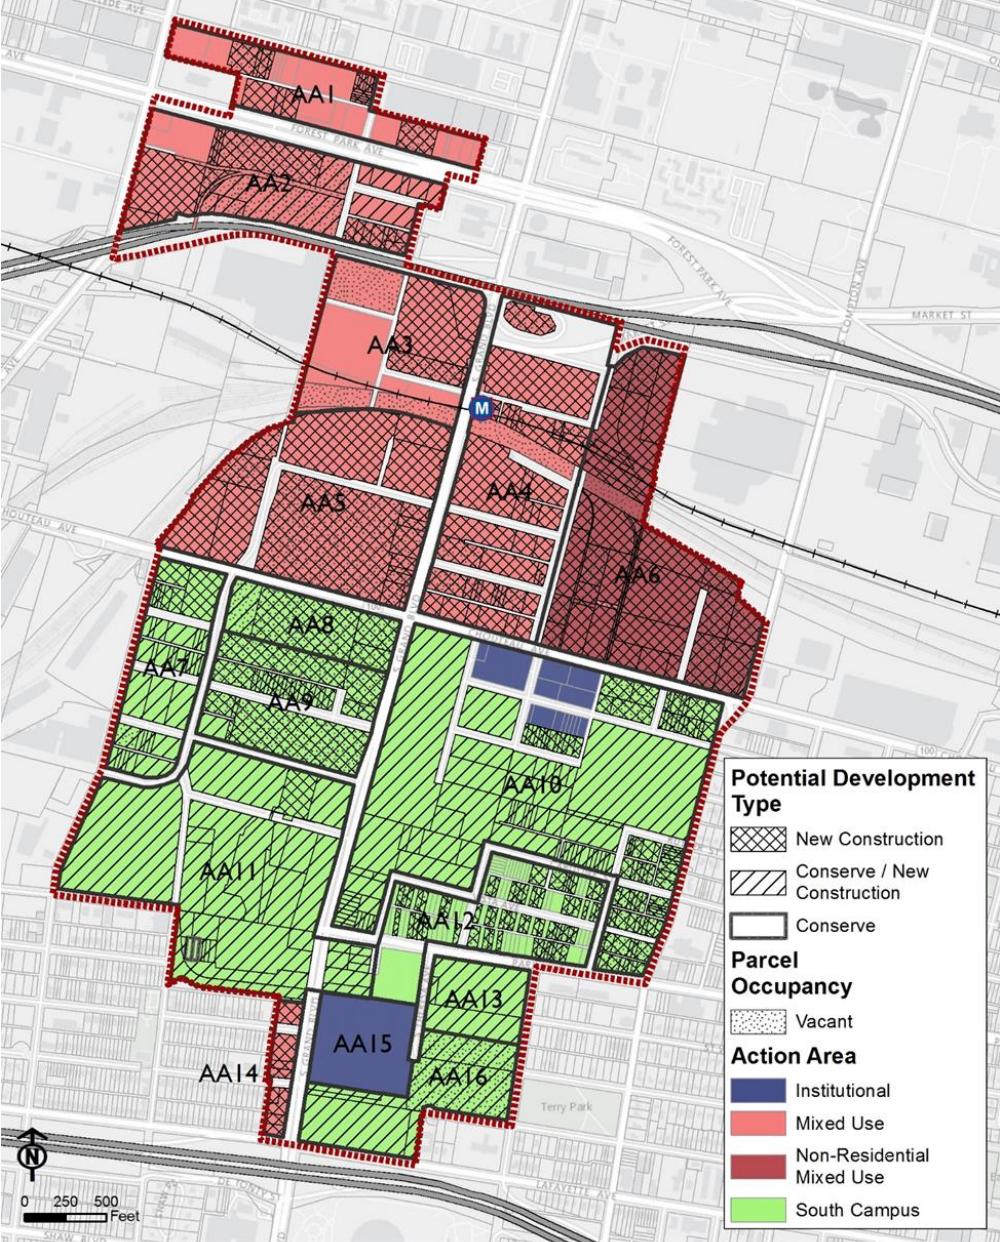 Midtown 353 Redevelopment Plan_potential development types